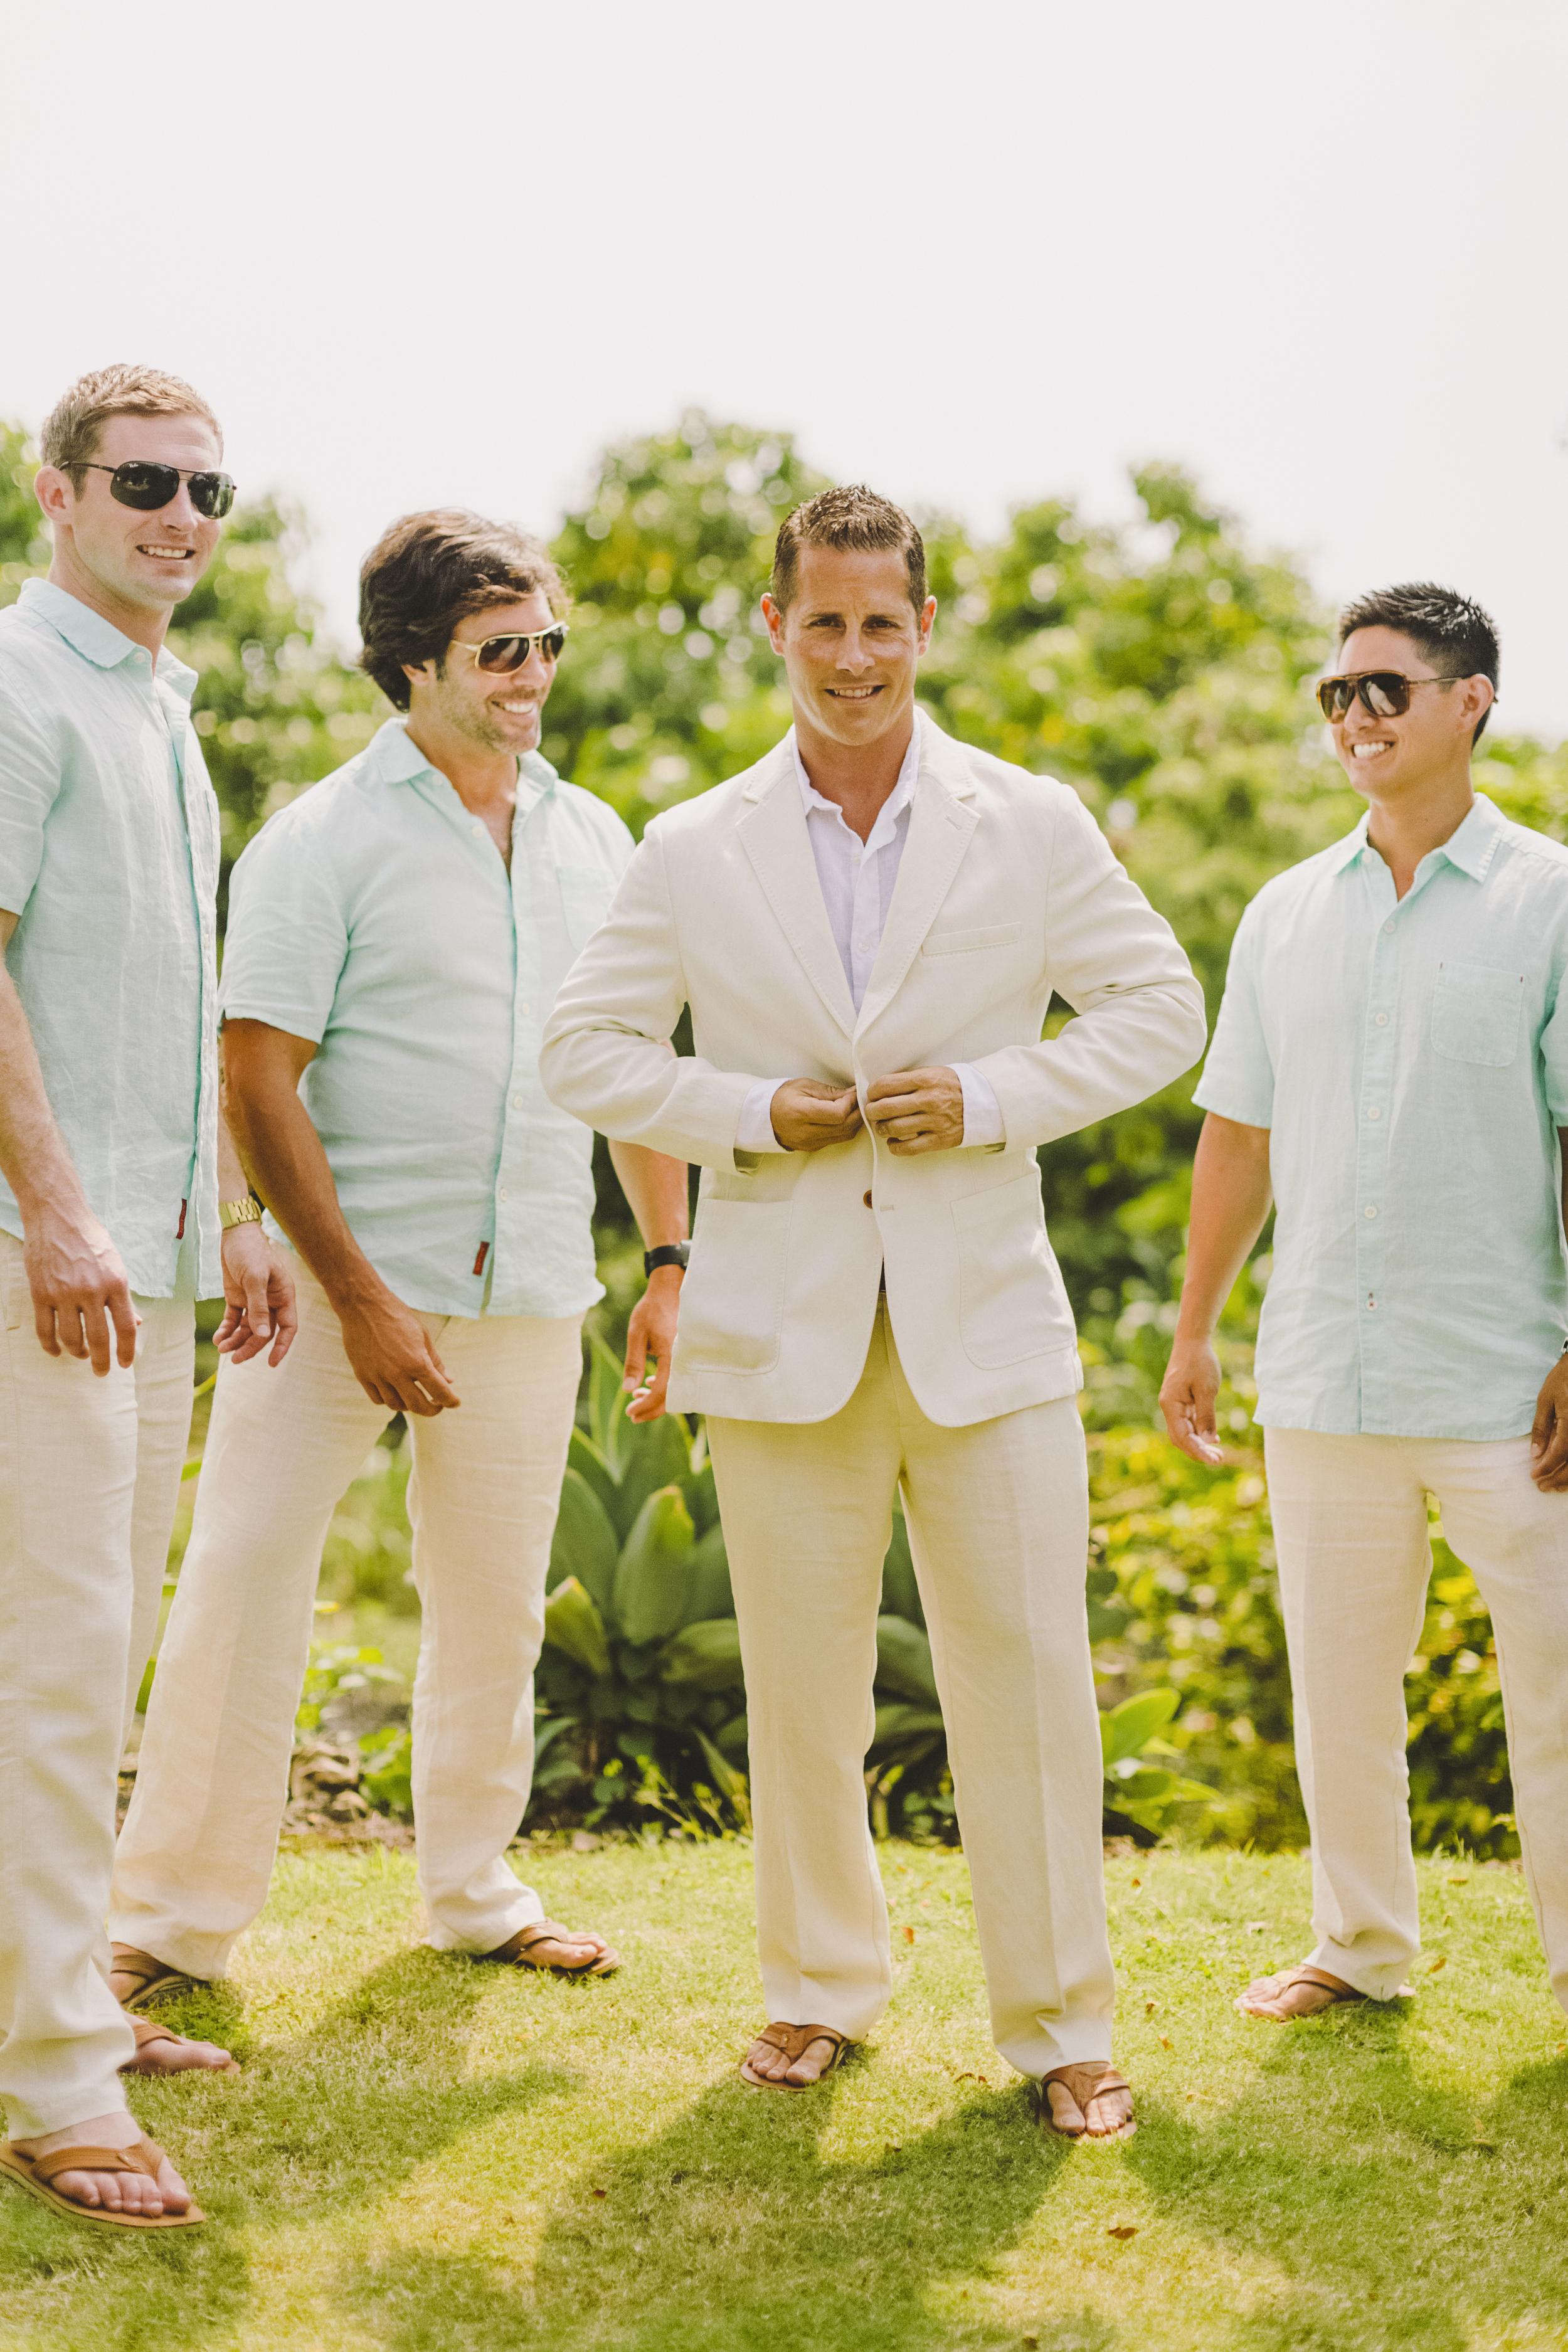 angie-diaz-photography-hawaii-wedding-photographer-kelli-jay-25.jpg